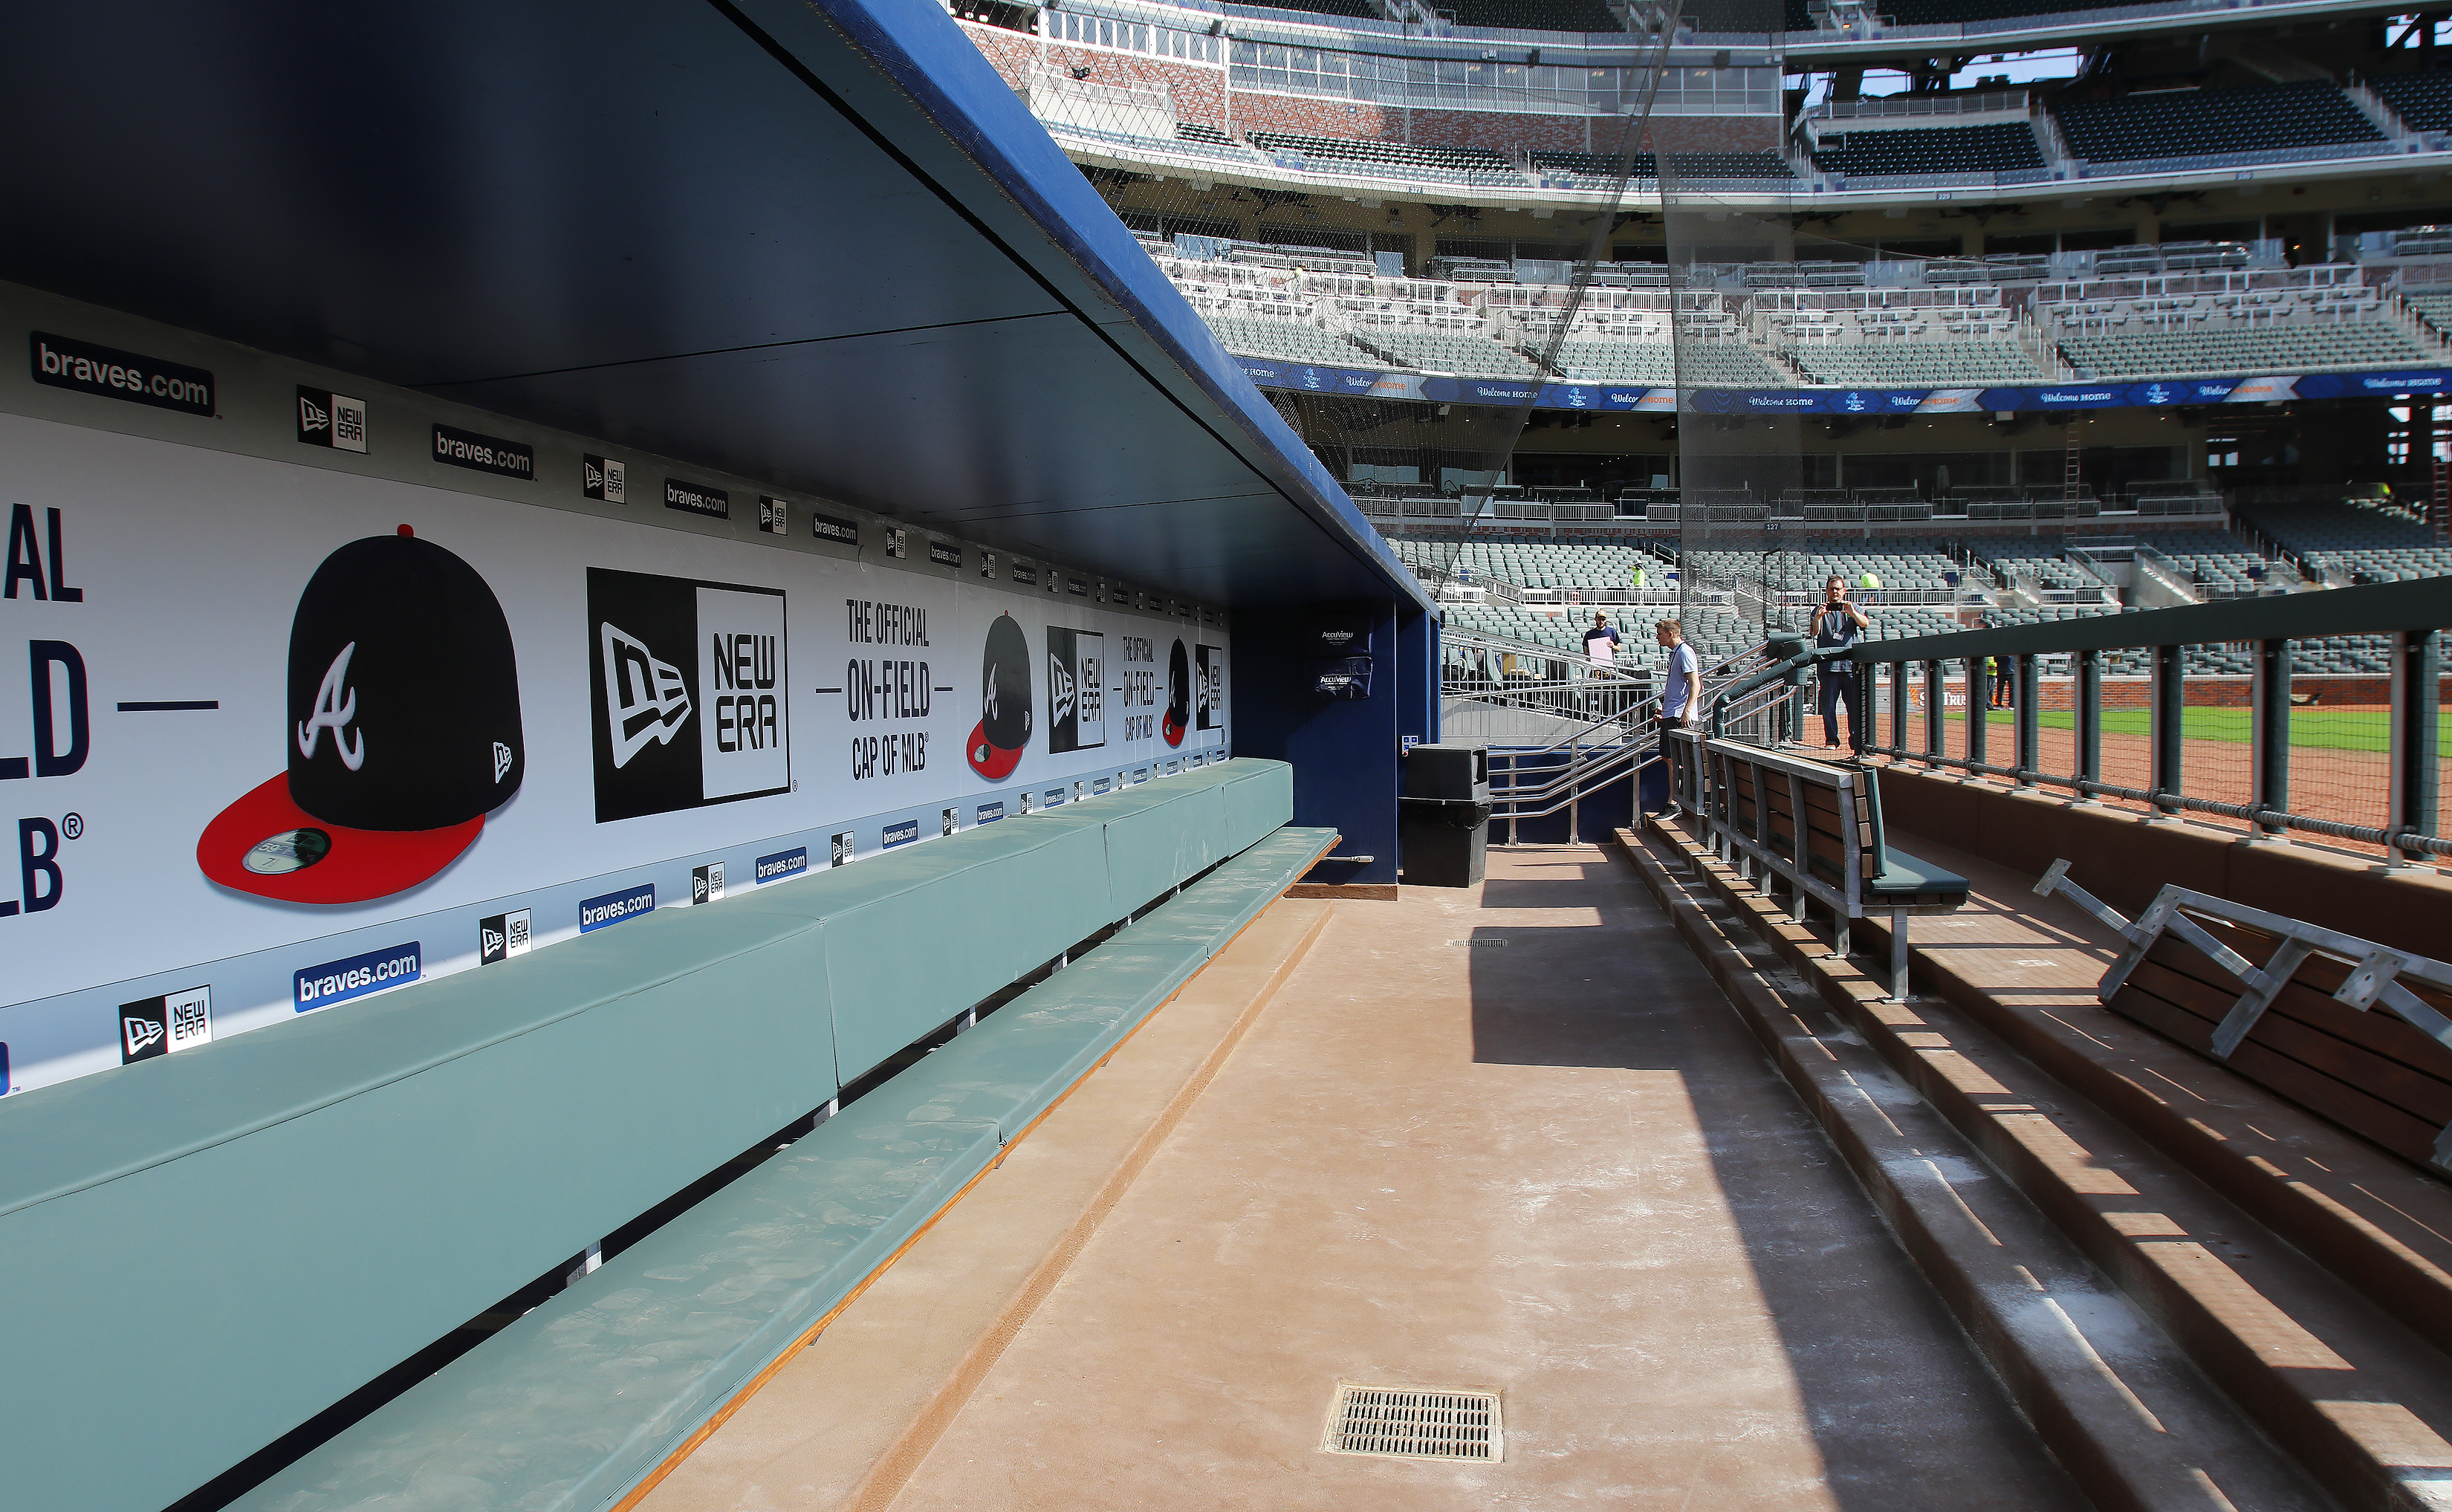 MLB: MAR 29 Atlanta Braves SunTrust Park